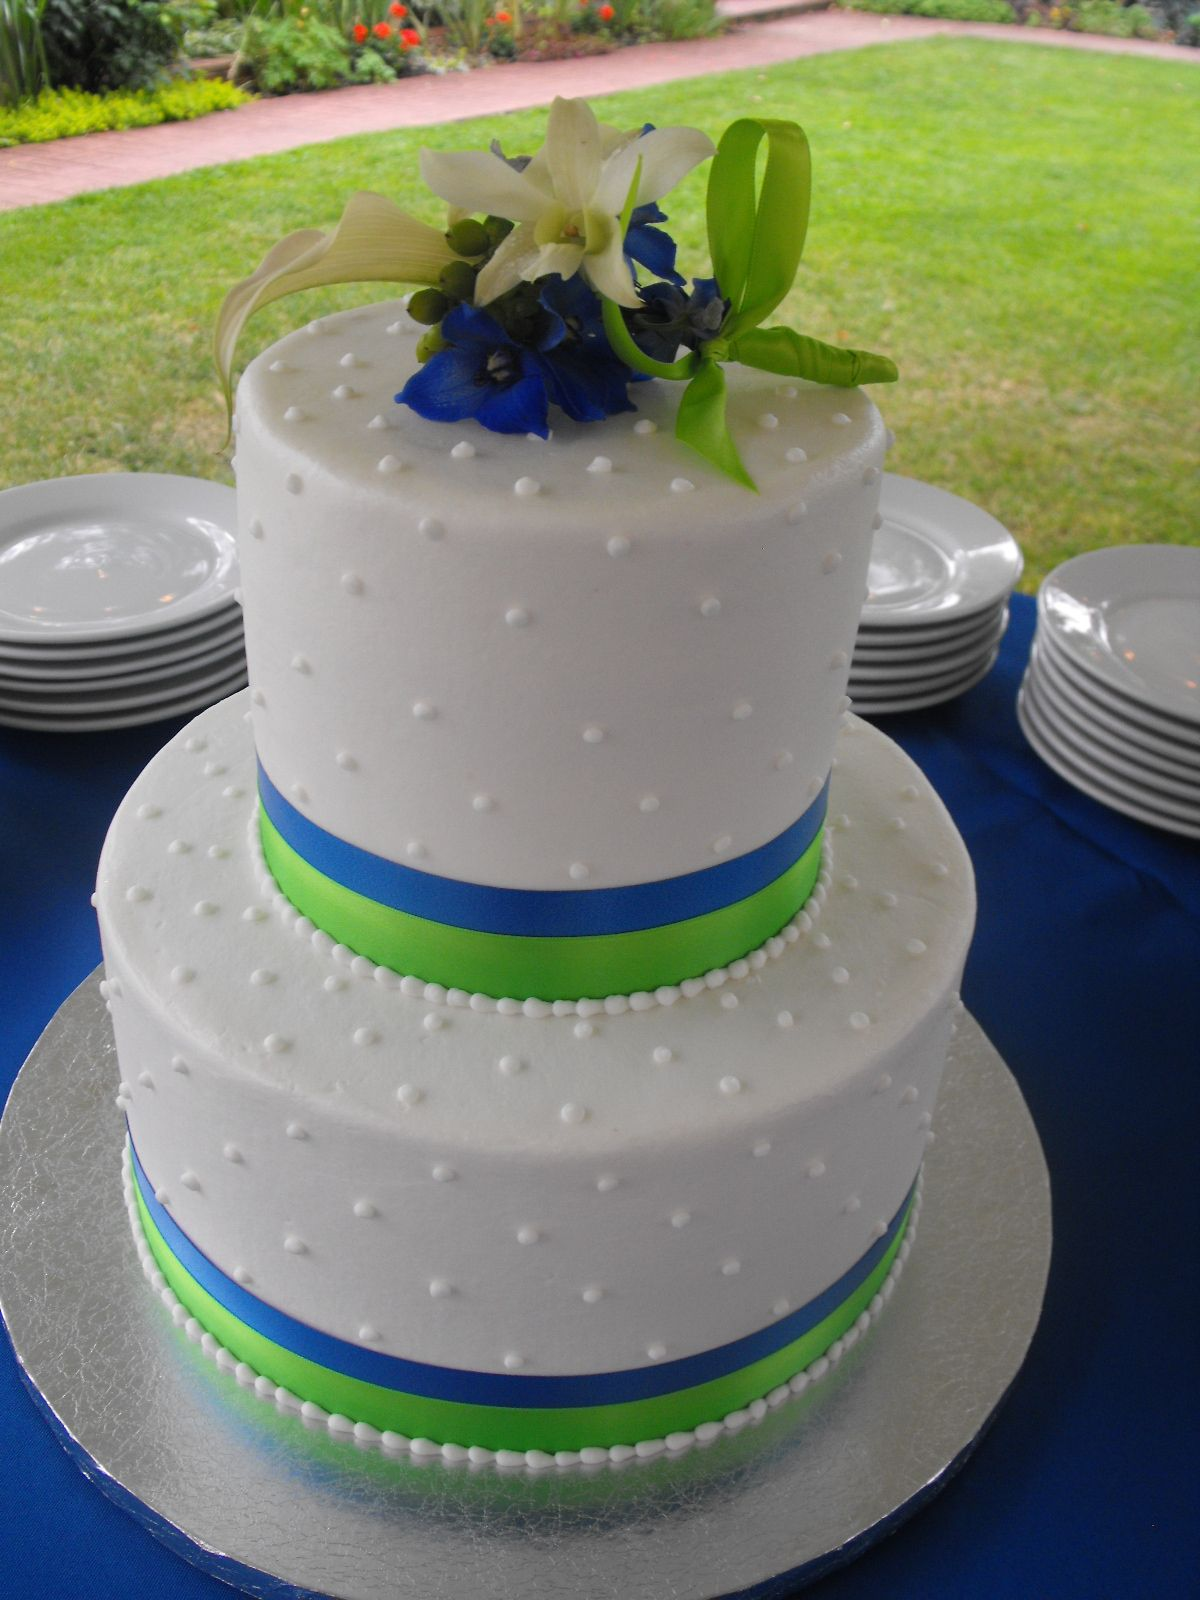 navy blue and kelly green wedding invitations%0A Royal blue and lime green wedding cake